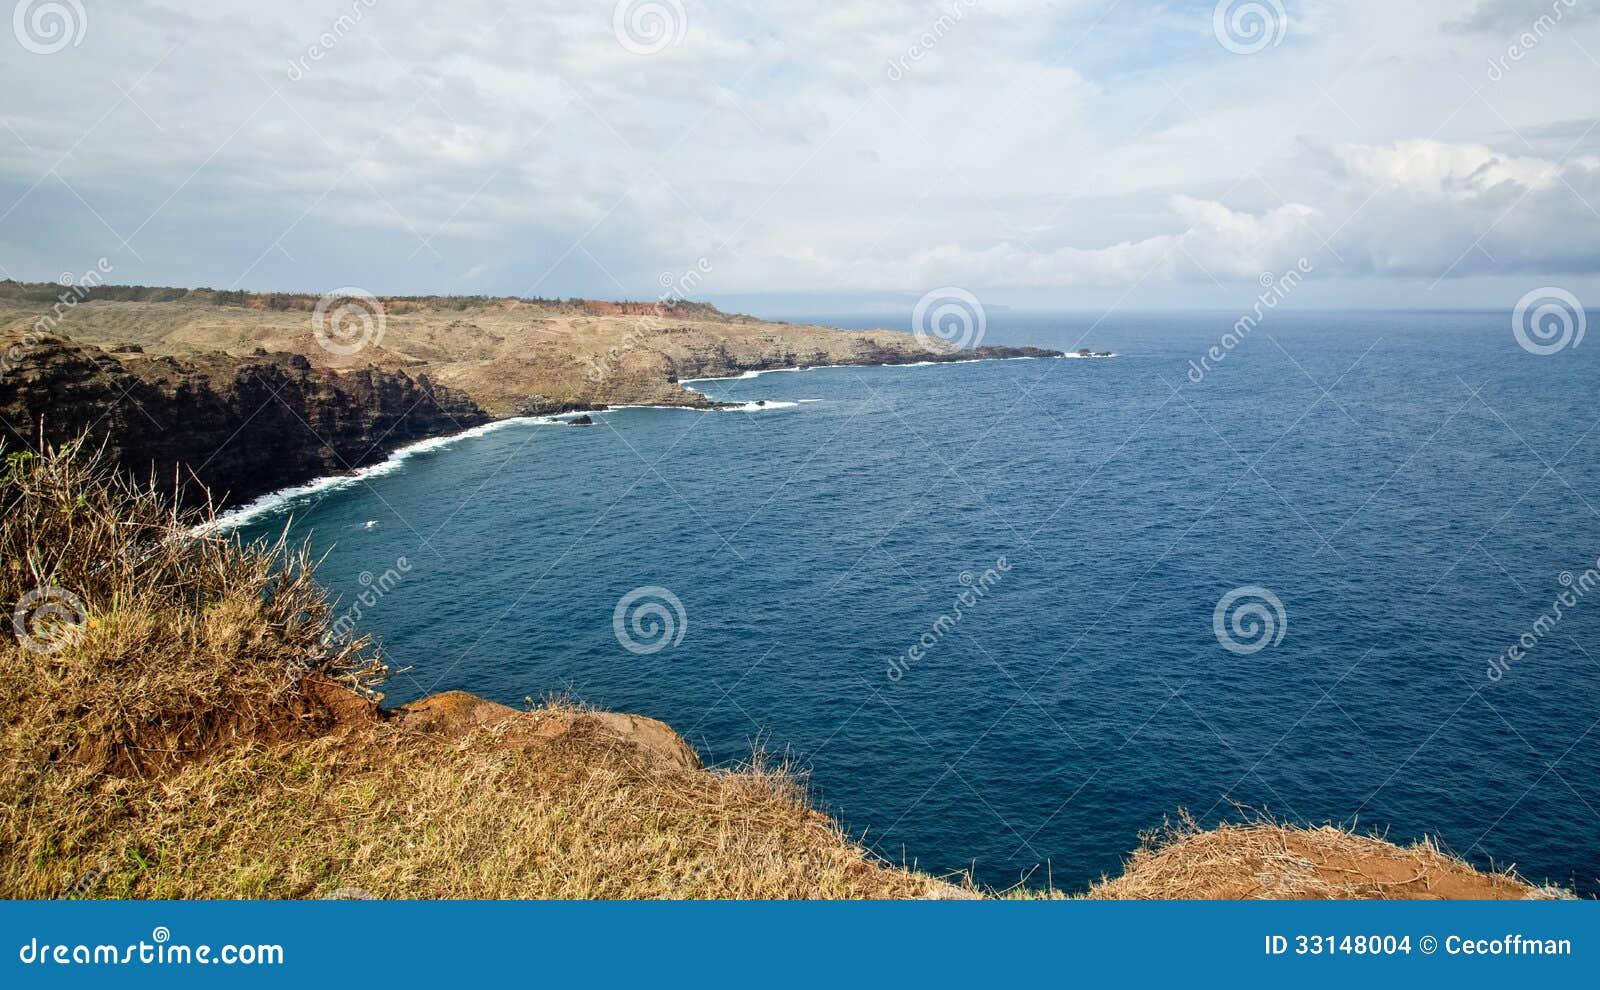 Maui's Coastline Stock Images - Image: 33148004